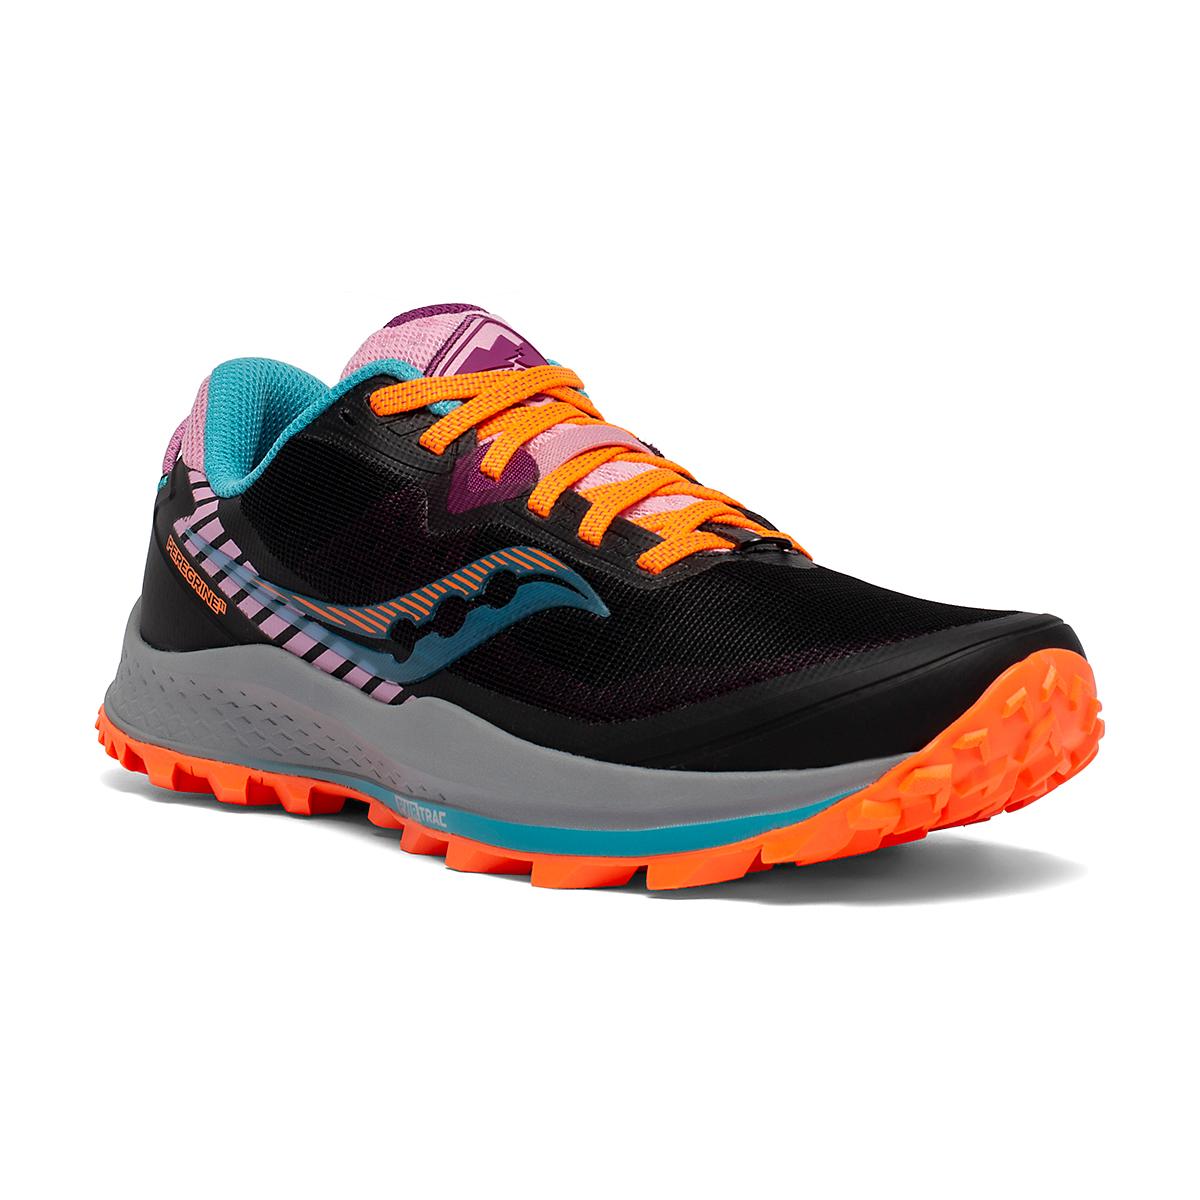 Women's Saucony Peregrine 11 Trail Running Shoe - Color: Future/Black - Size: 5 - Width: Regular, Future/Black, large, image 3